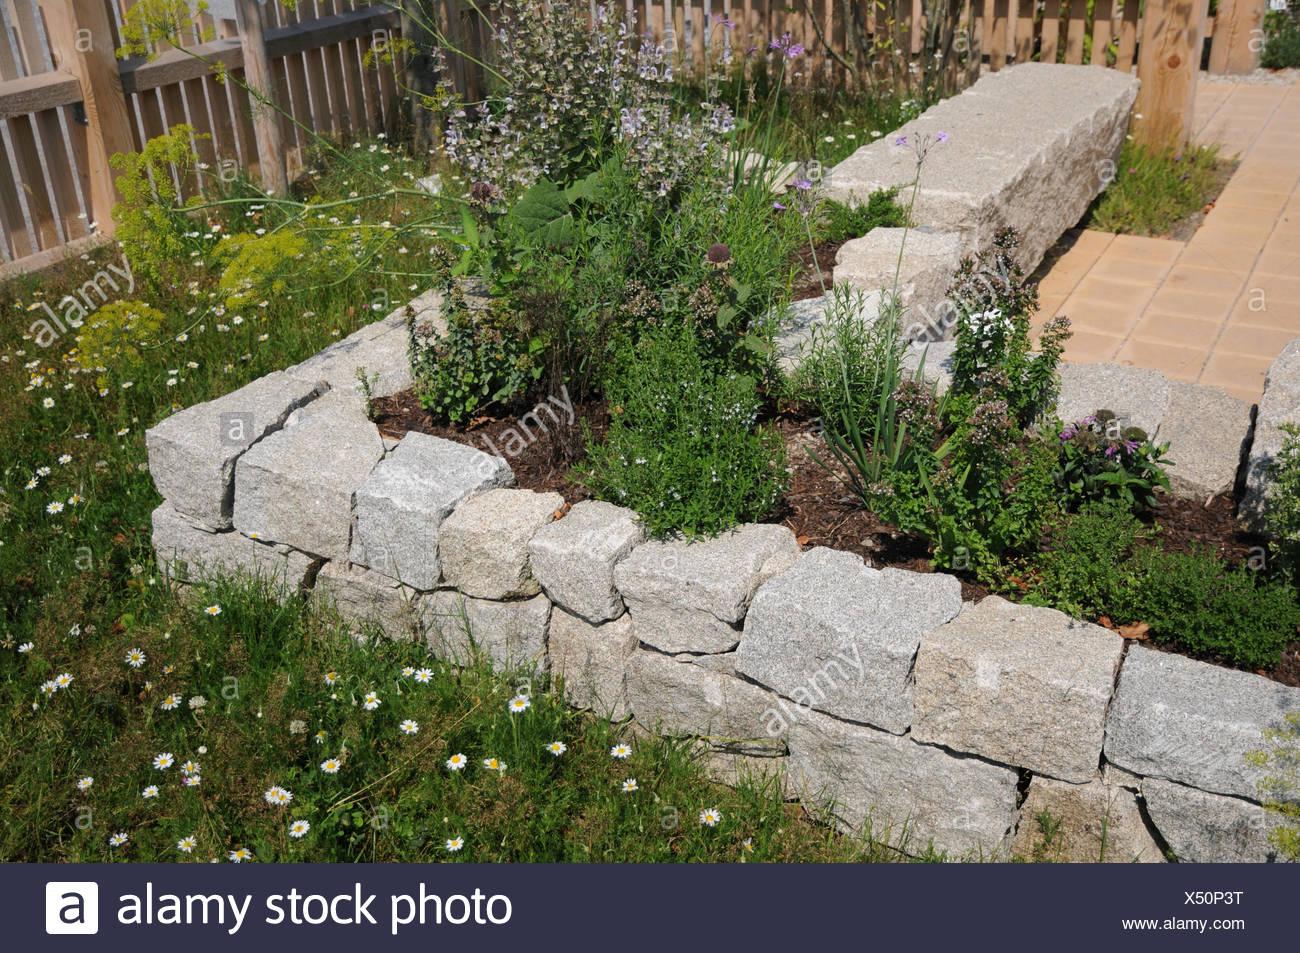 Raised bed made of granite stones Stock Photo